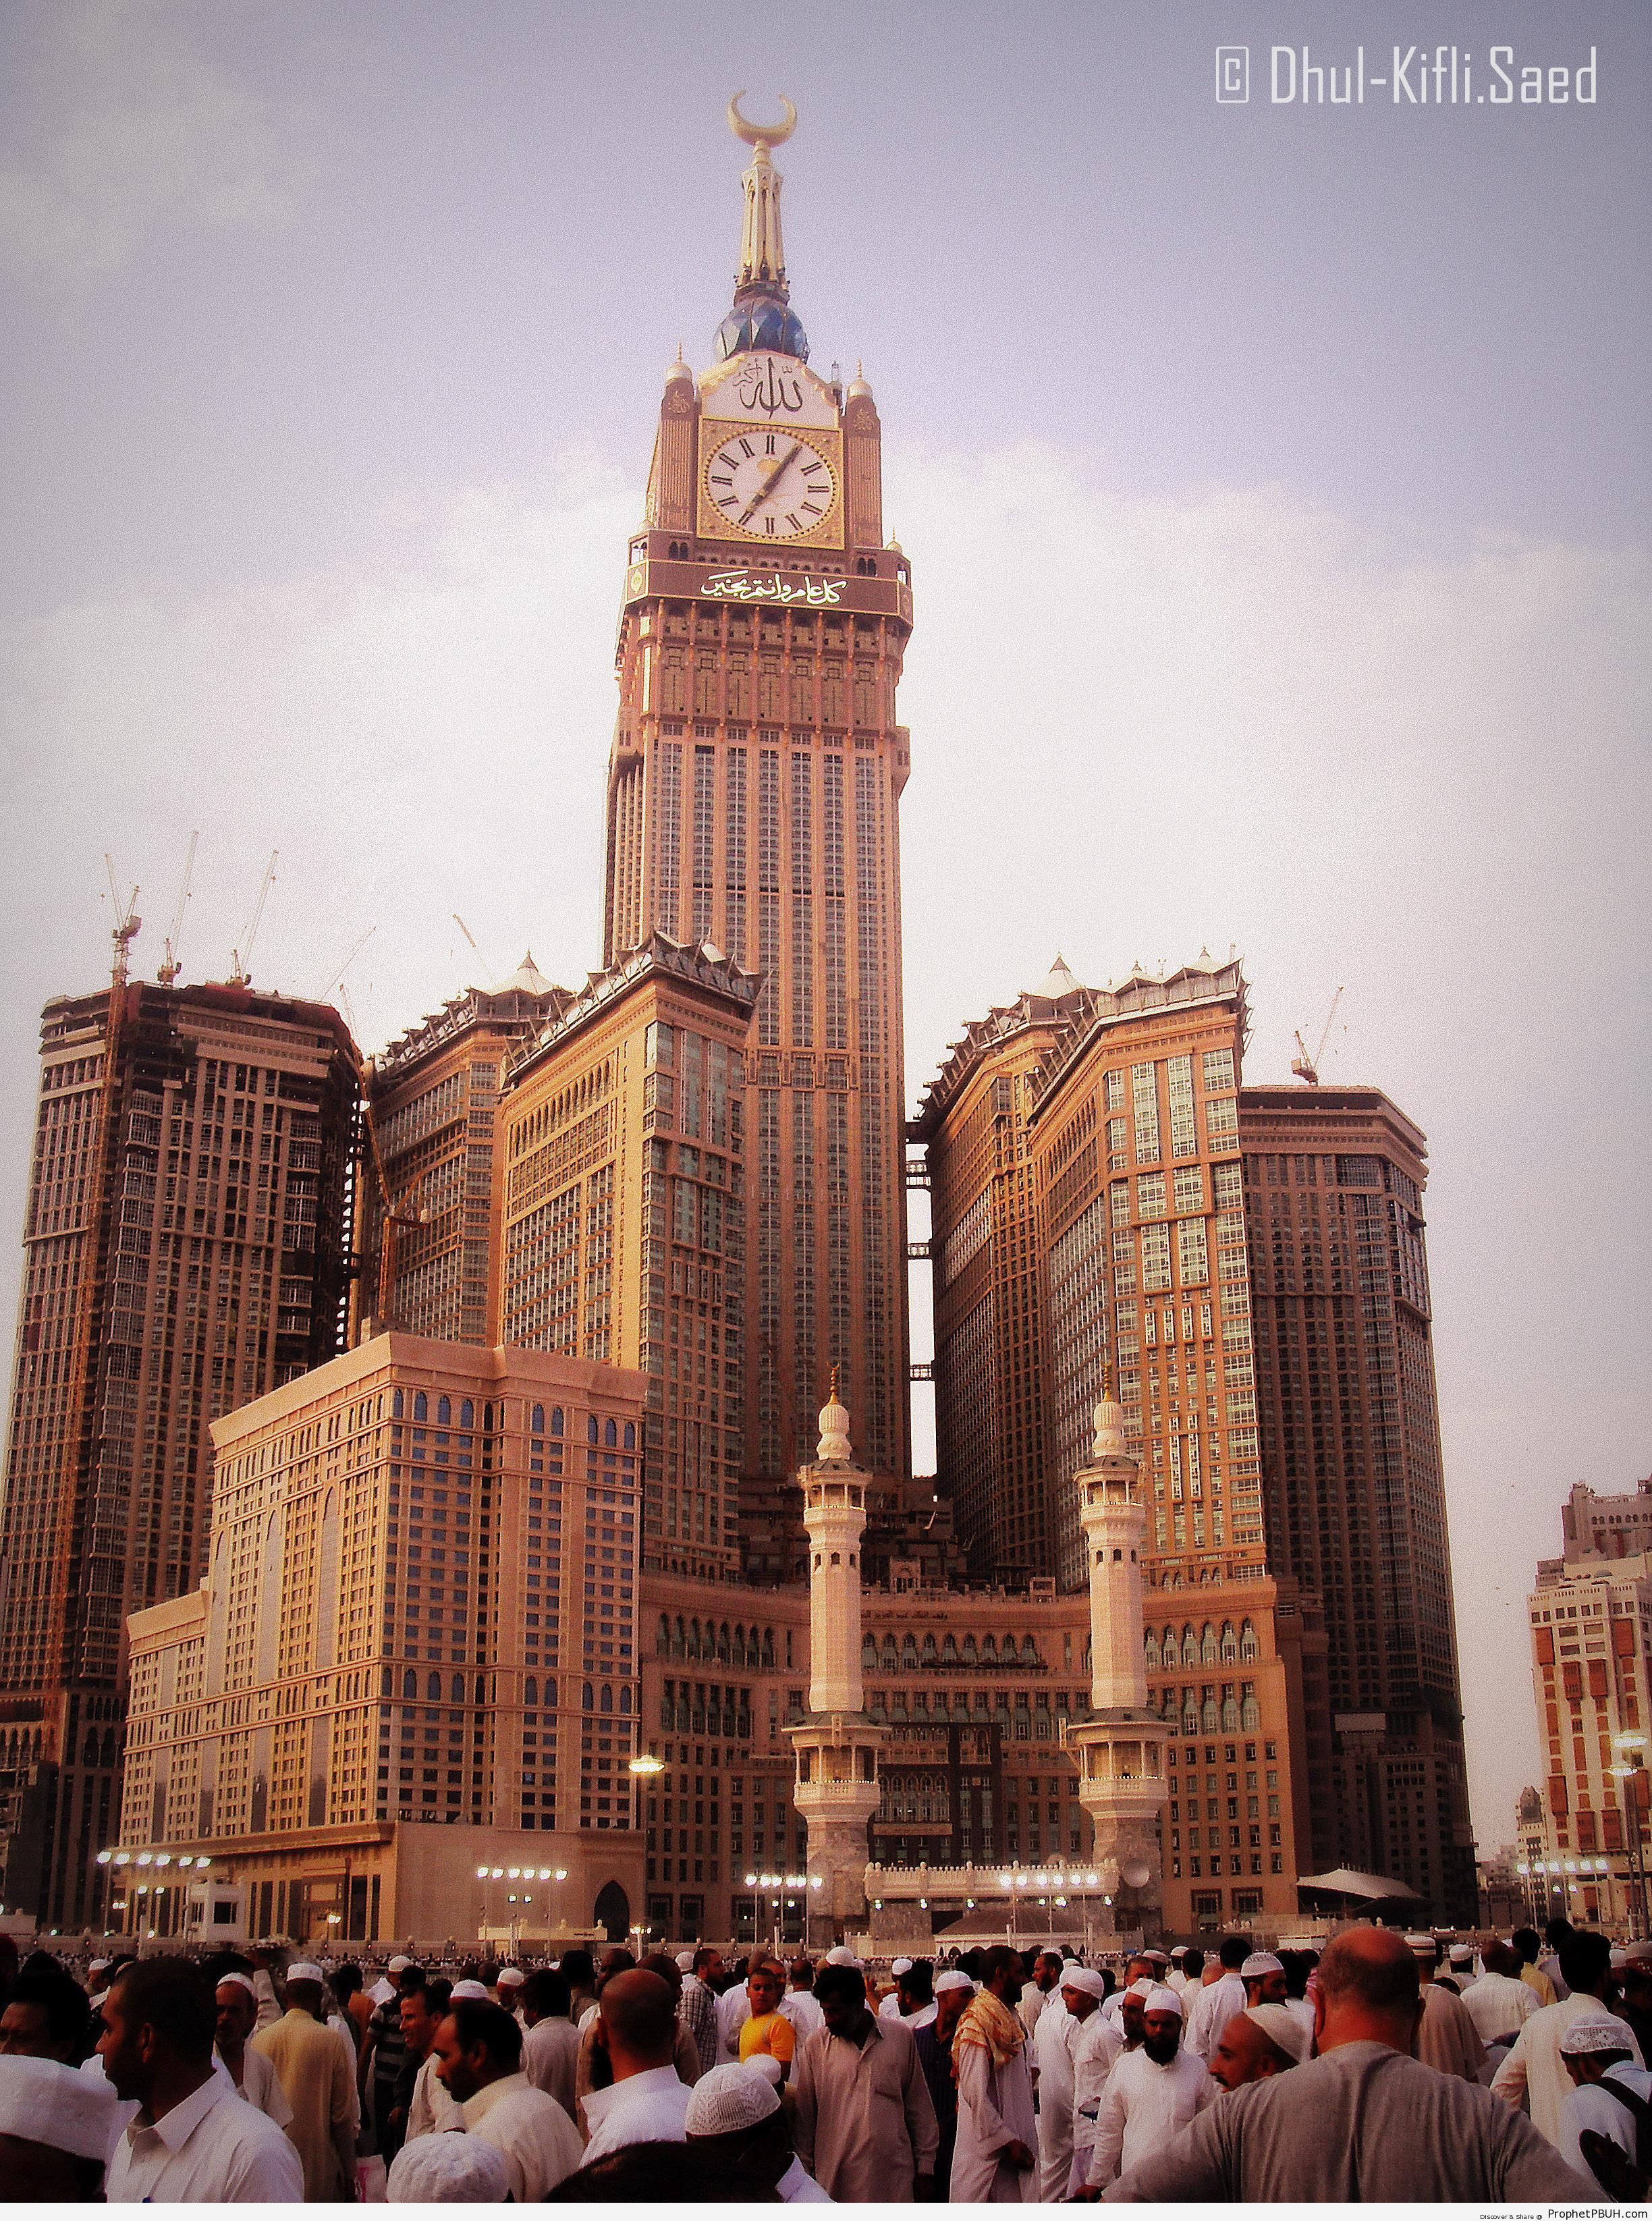 Photo of Crowded Masjid al-Haram Entrance With View of Abraj al-Bait Towers - al-Masjid al-Haram in Makkah, Saudi Arabia -Picture